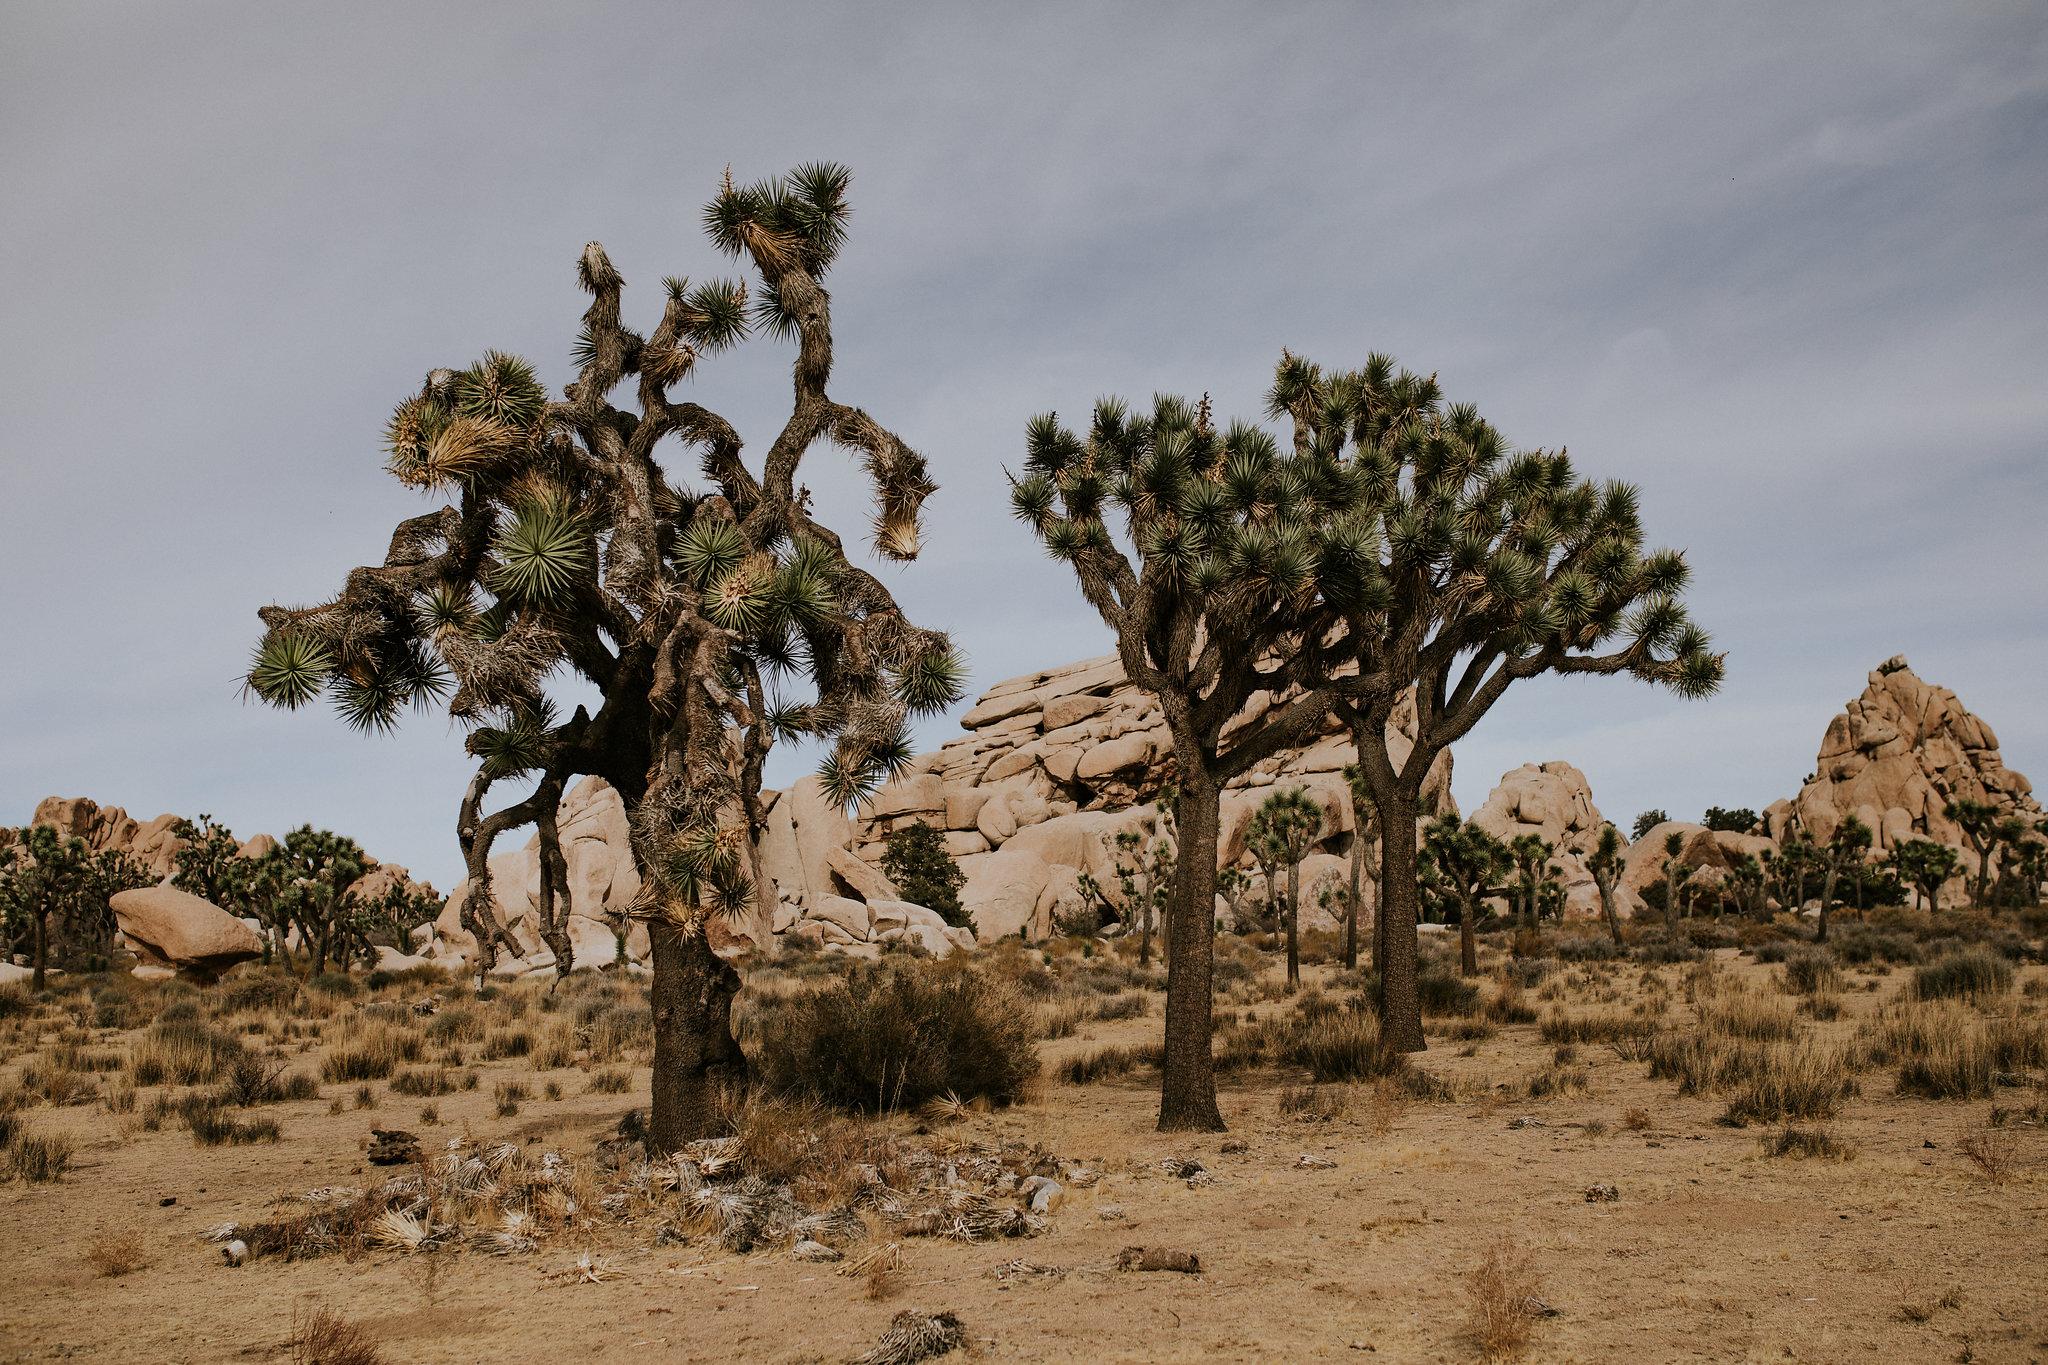 Joshua Tree Elopement Photographer - Destination Elopement Videographer - Joshua Tree Wedding - Vow of the Wild